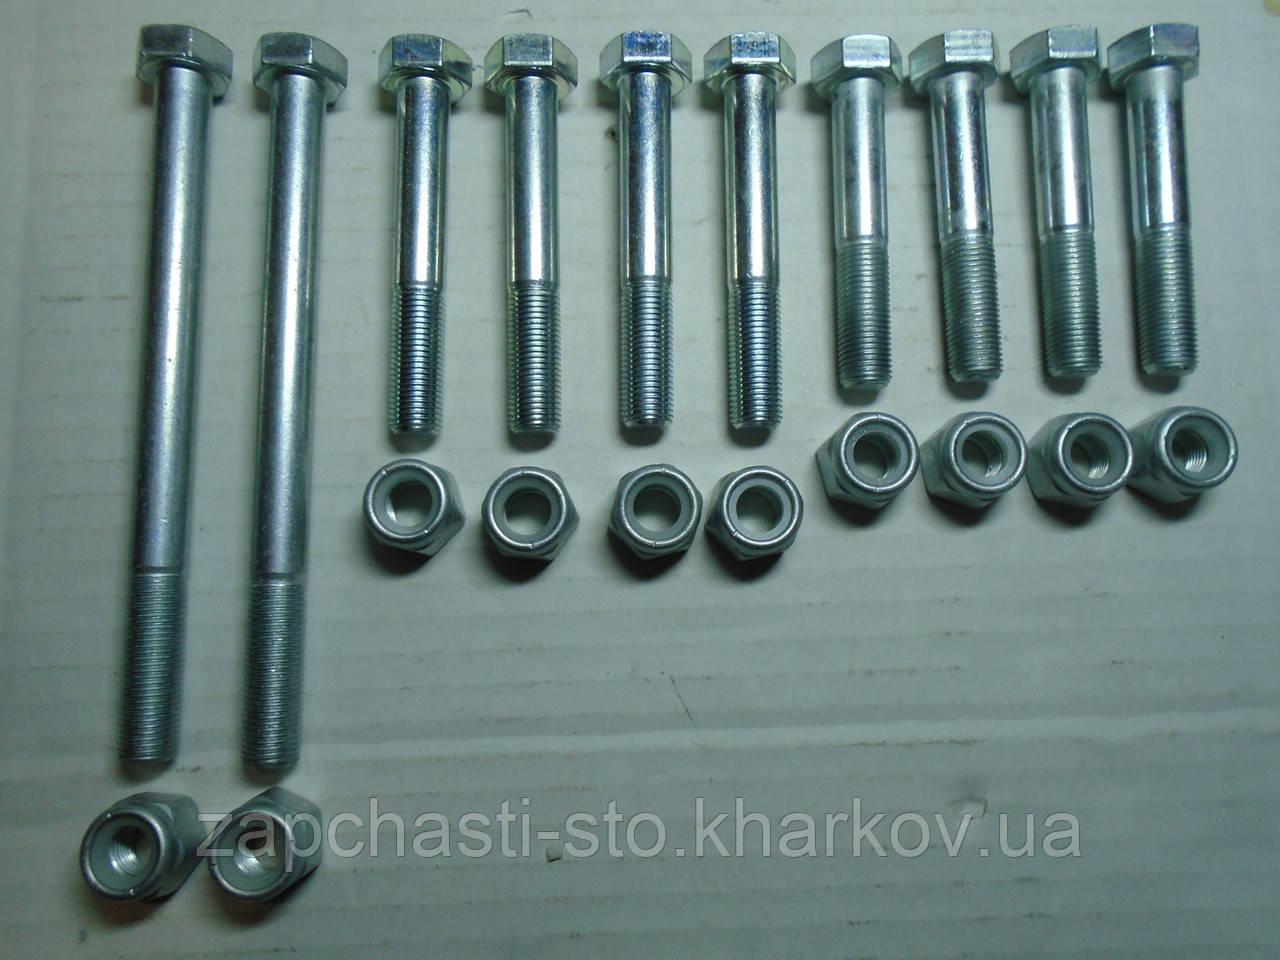 Болты реактивных тяг ВАЗ 2101-2107, Нива с гайками